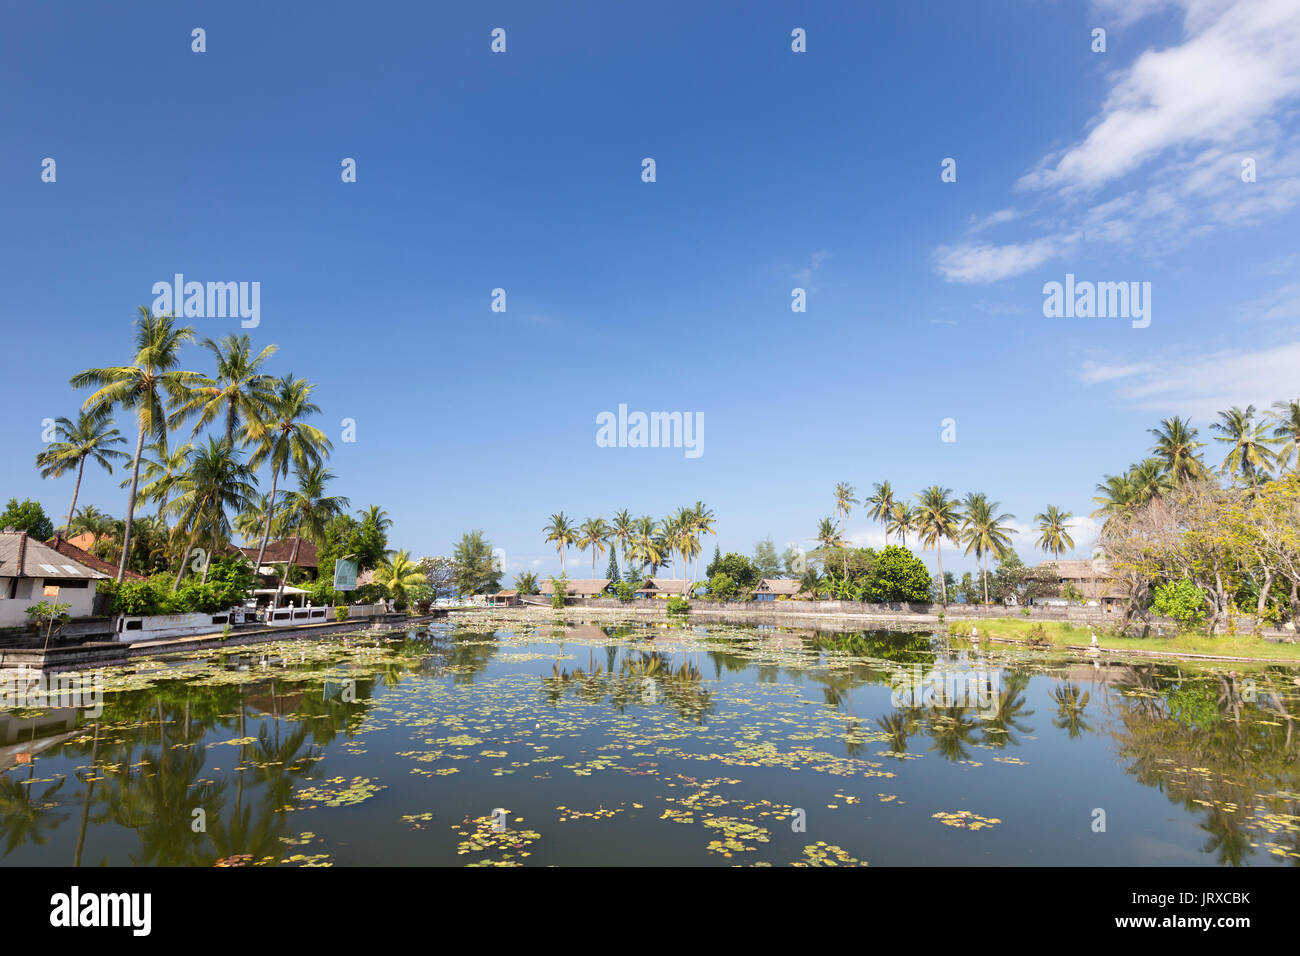 Lotus nenúfares que crecen en la laguna de Candidasa, Bali, Indonesia Imagen De Stock